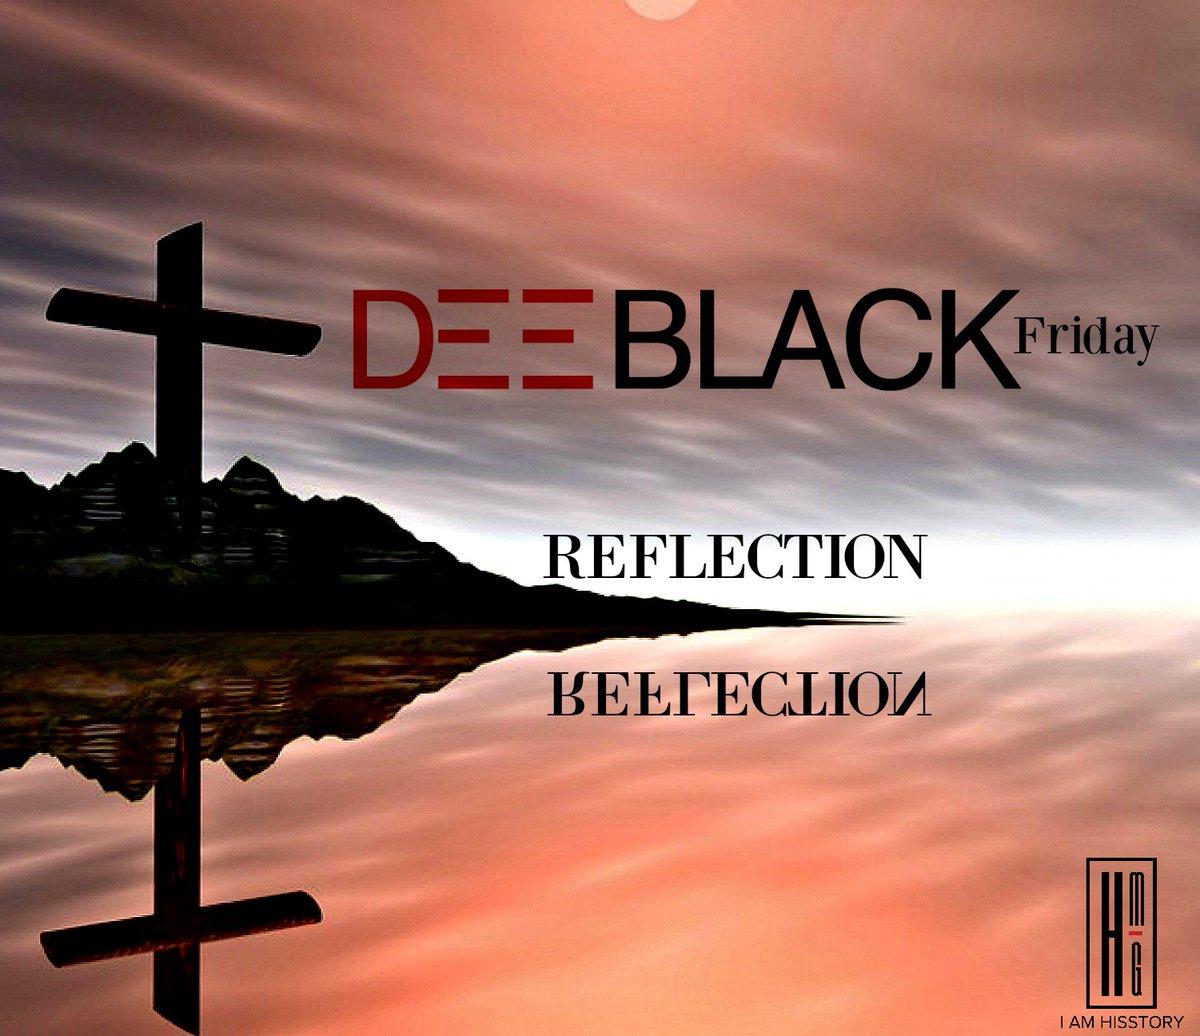 dee-black